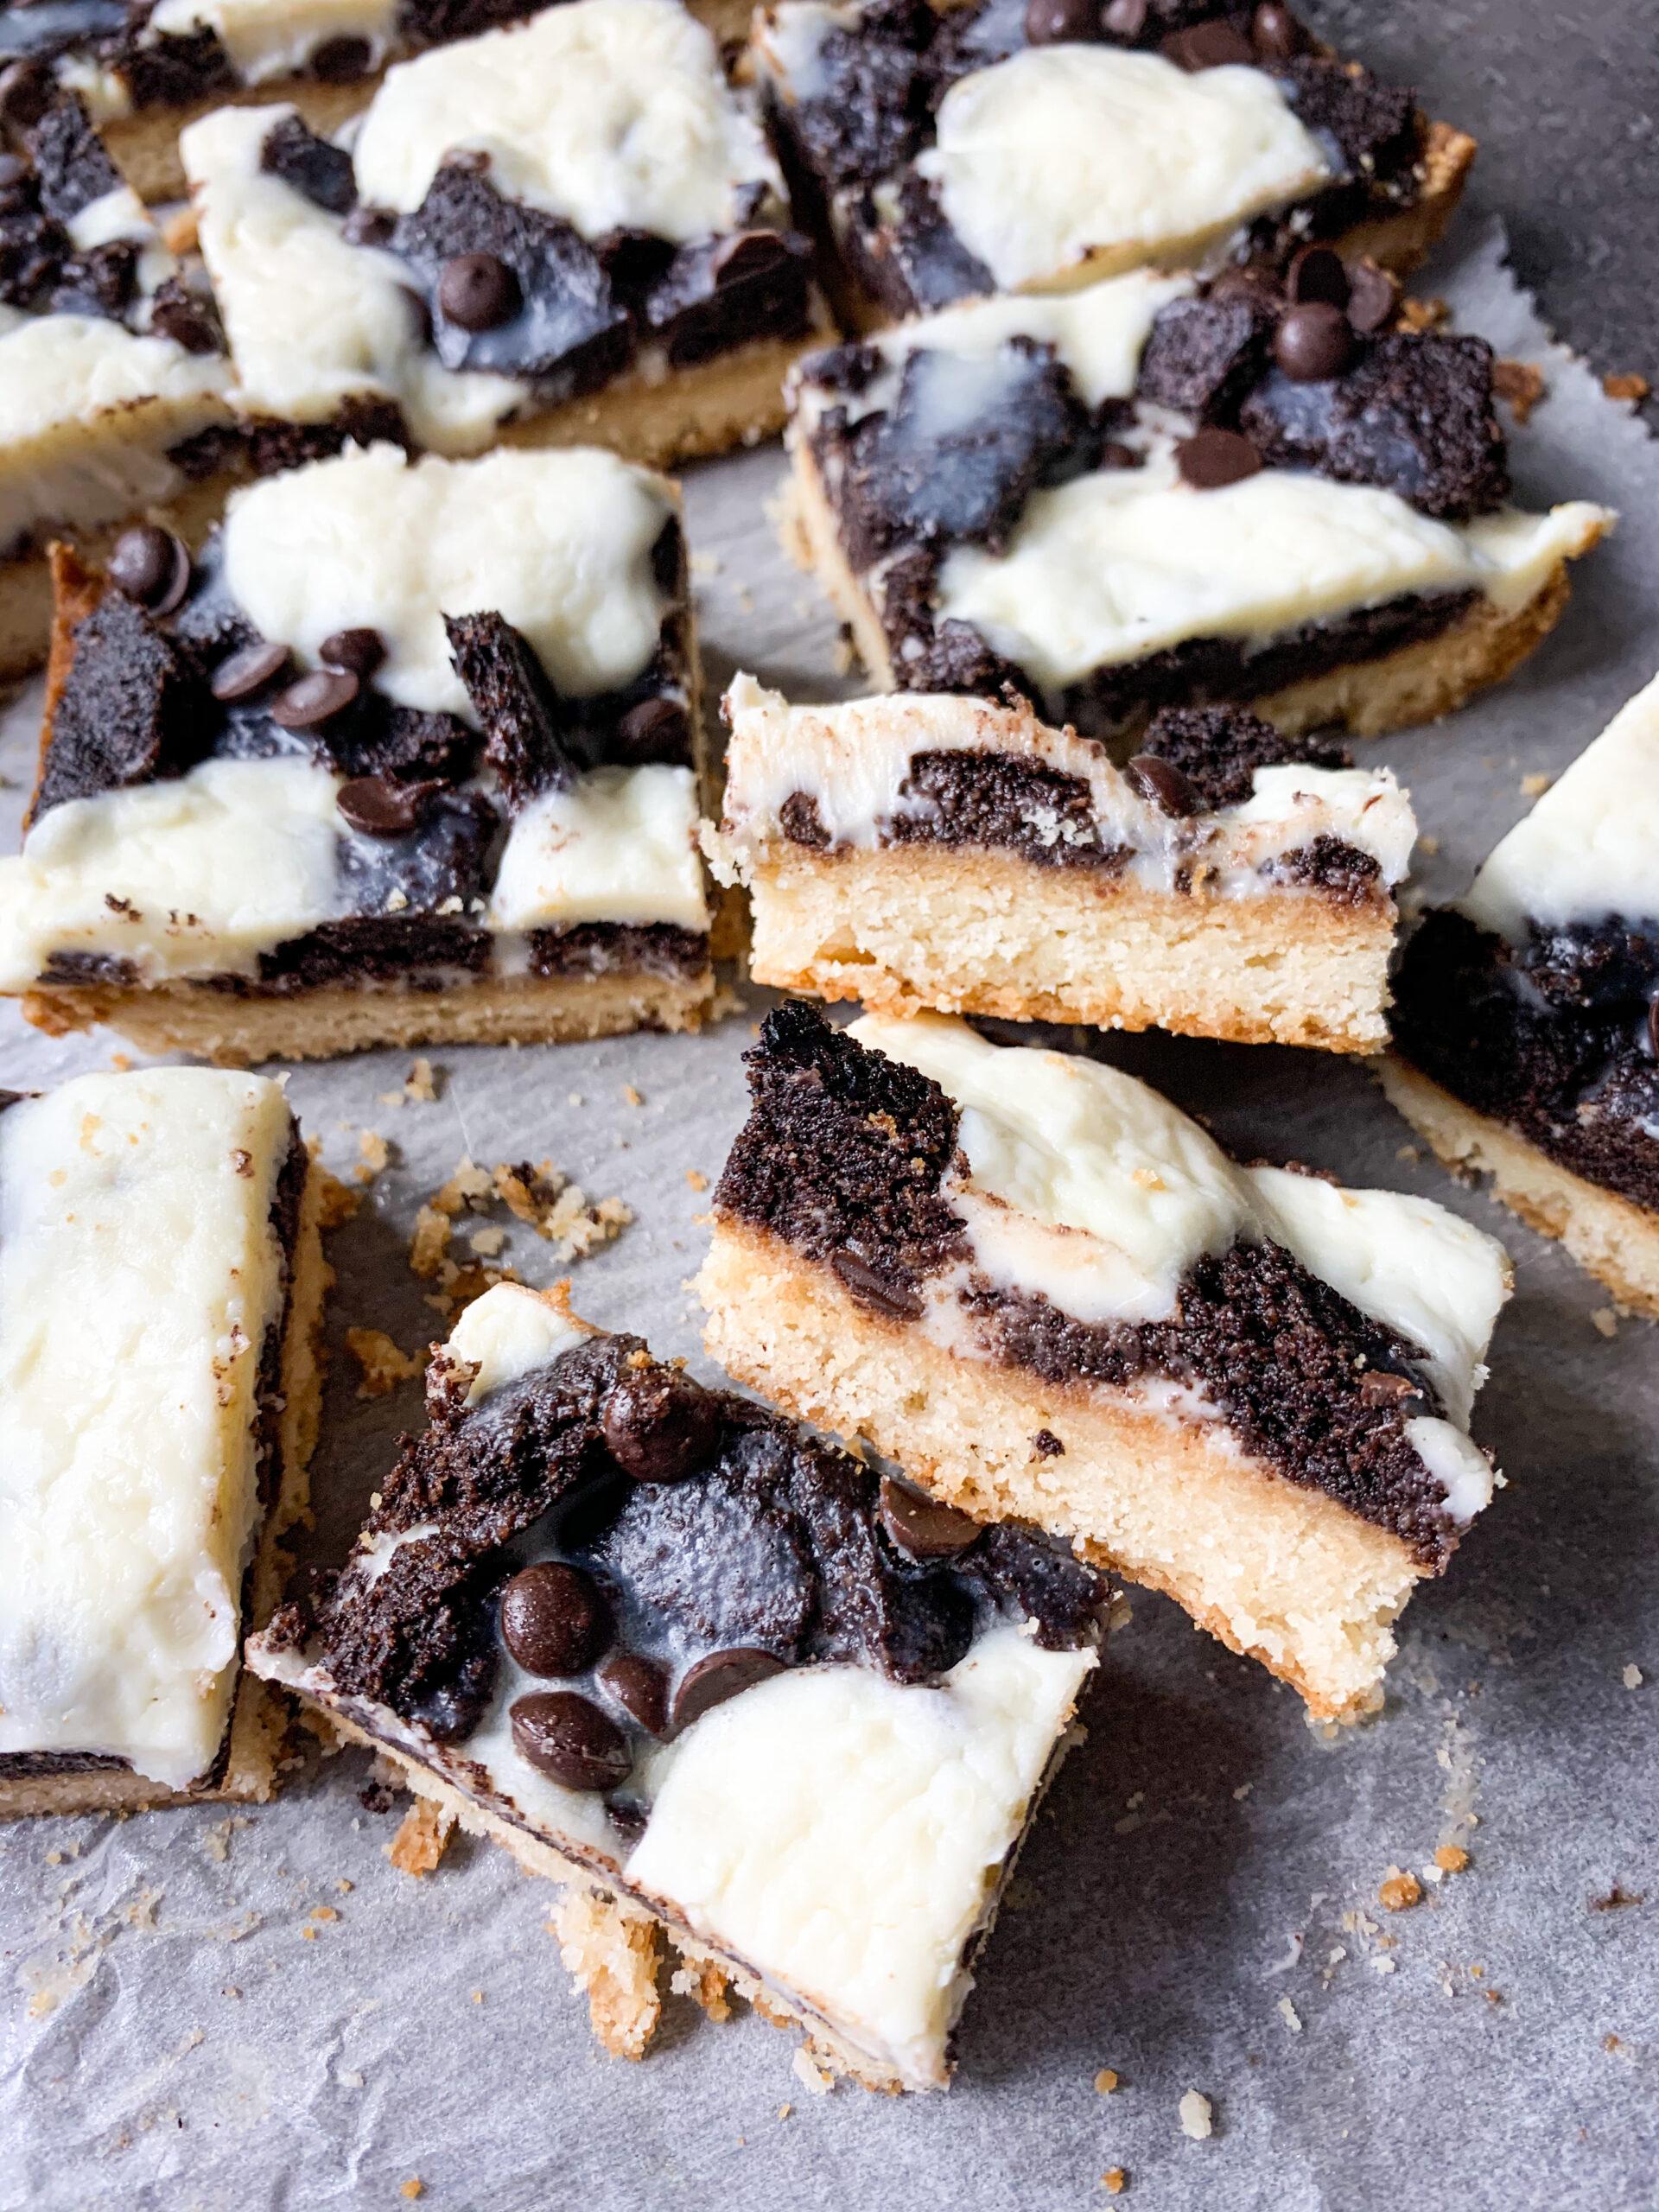 Picture of Keto Oreo cheesecake magic cookie bars